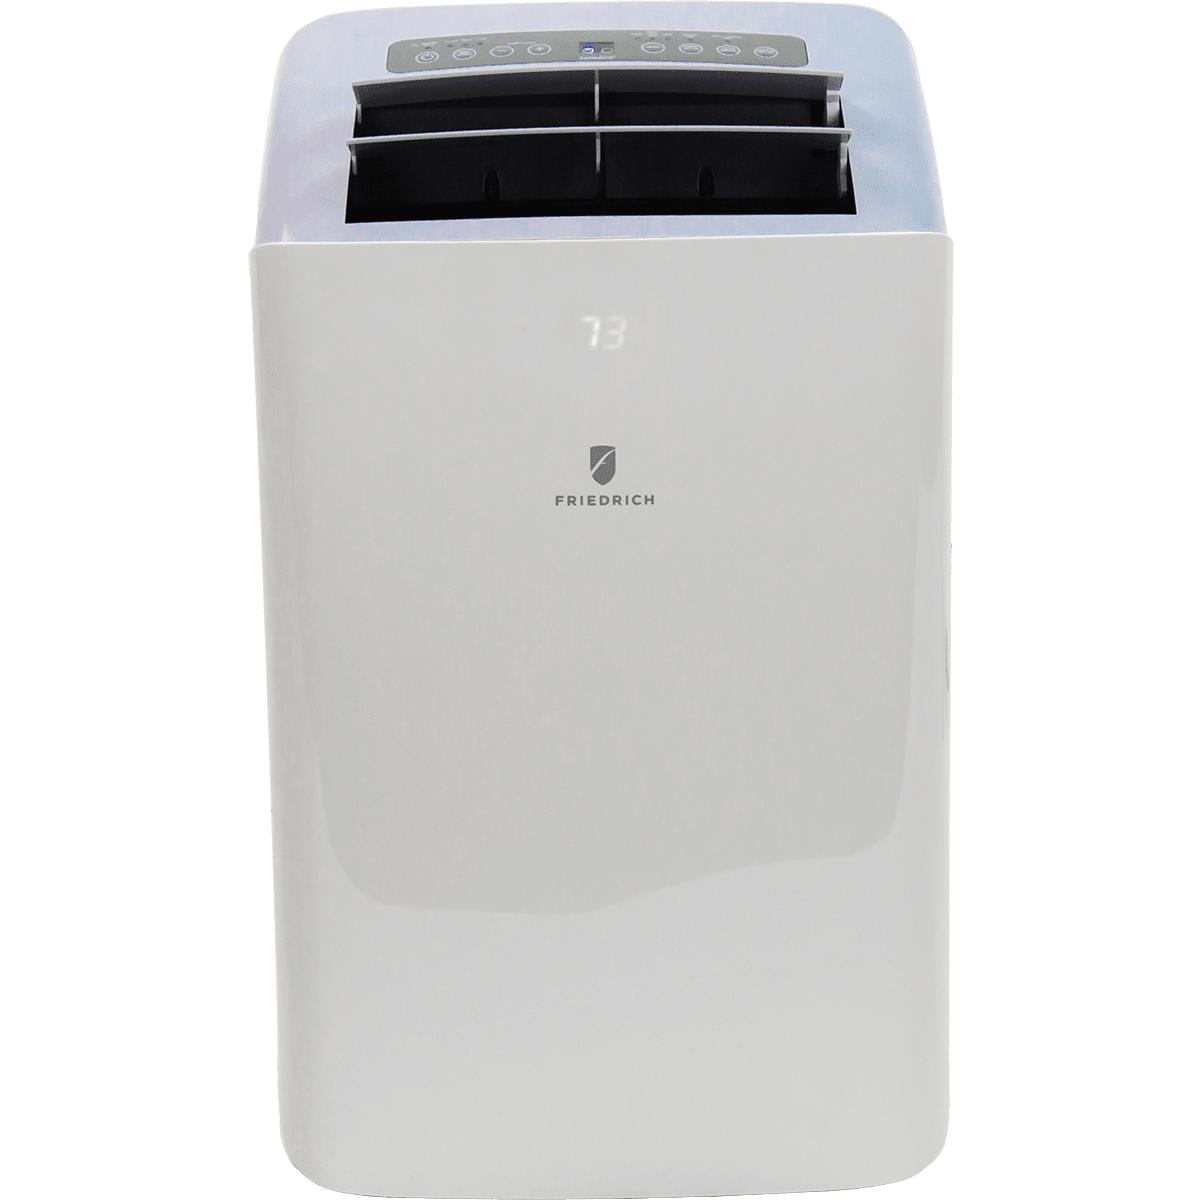 Friedrich 12,000 BTU Portable Air Conditioner